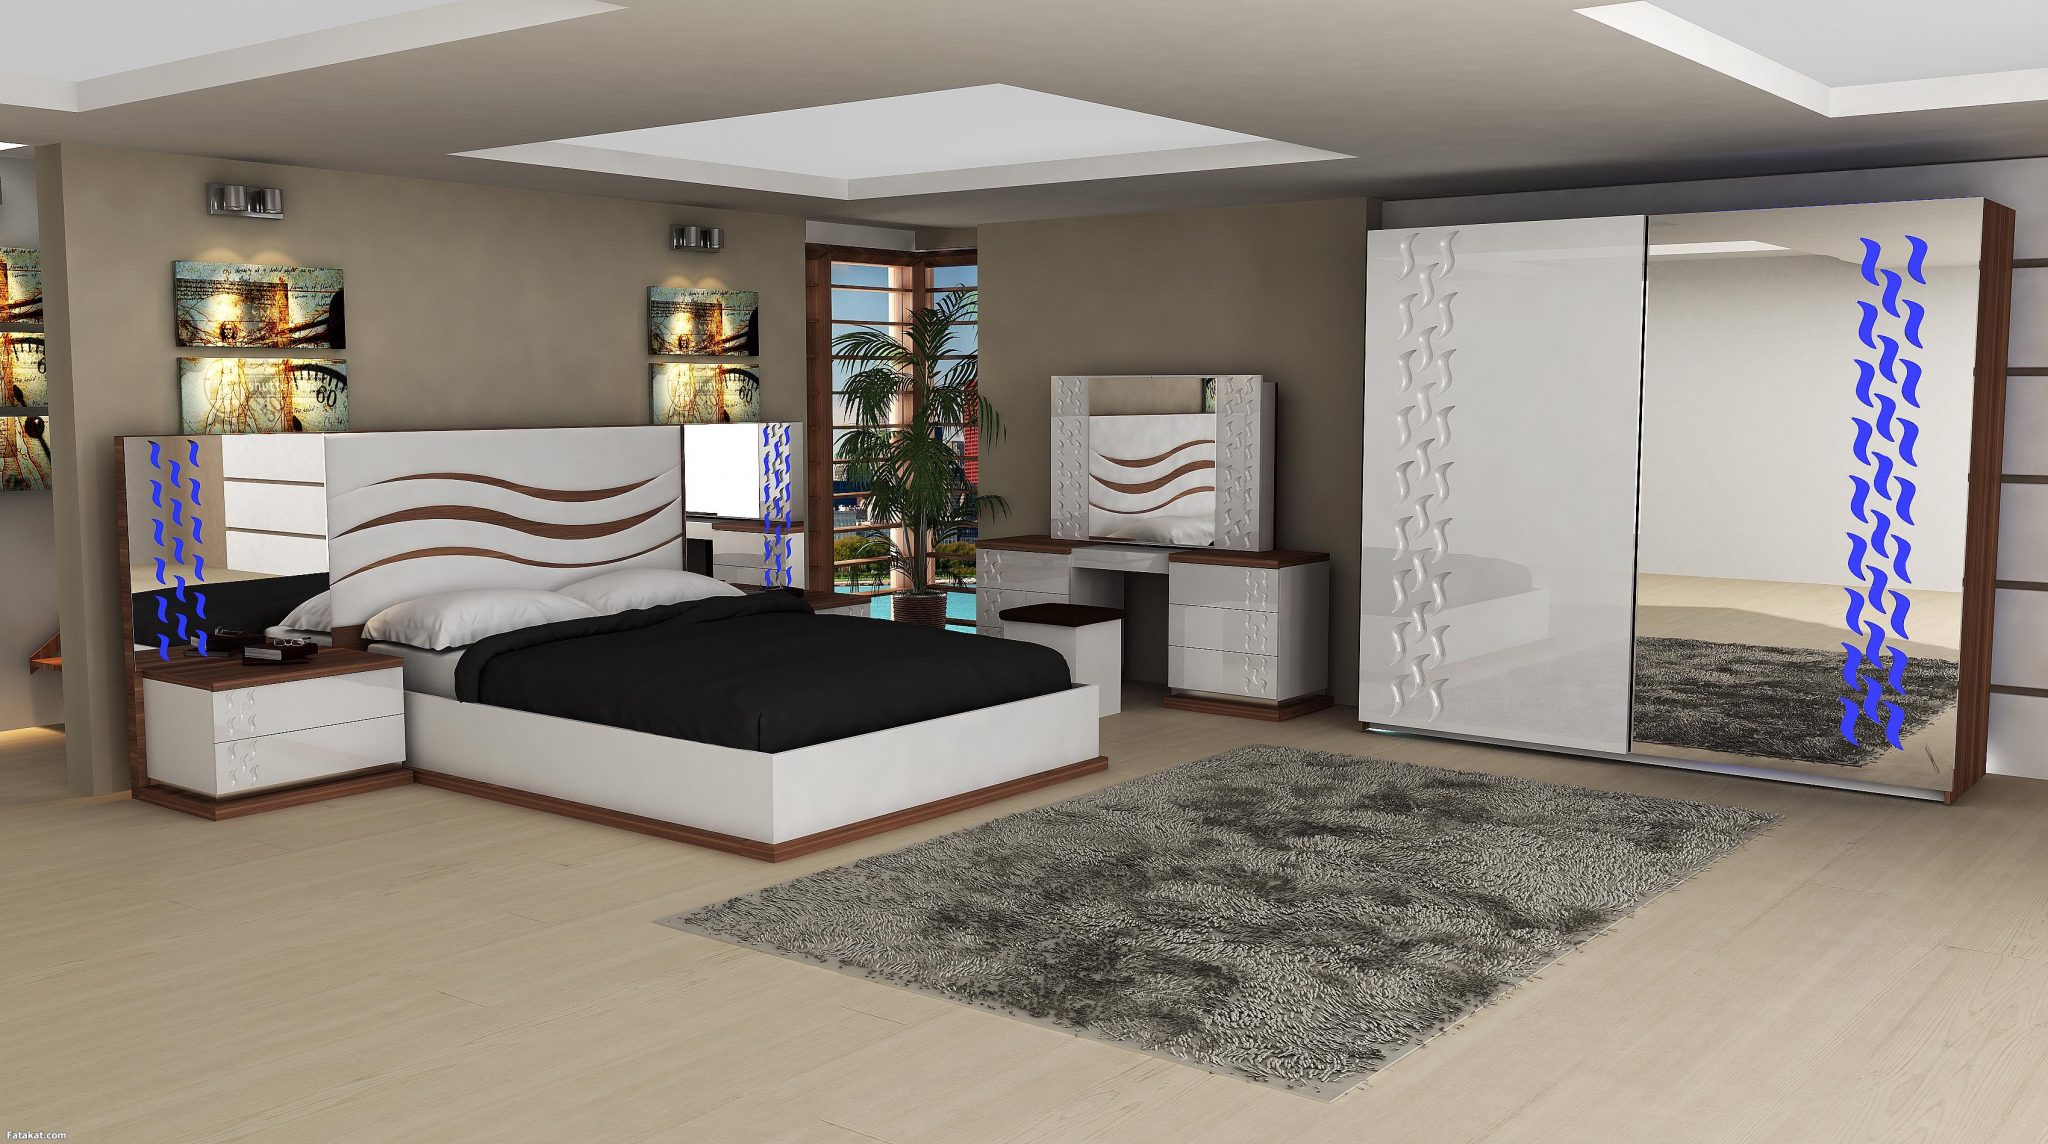 بالصور غرف نوم حديثه , احدث اشكال غرف النوم 3687 9